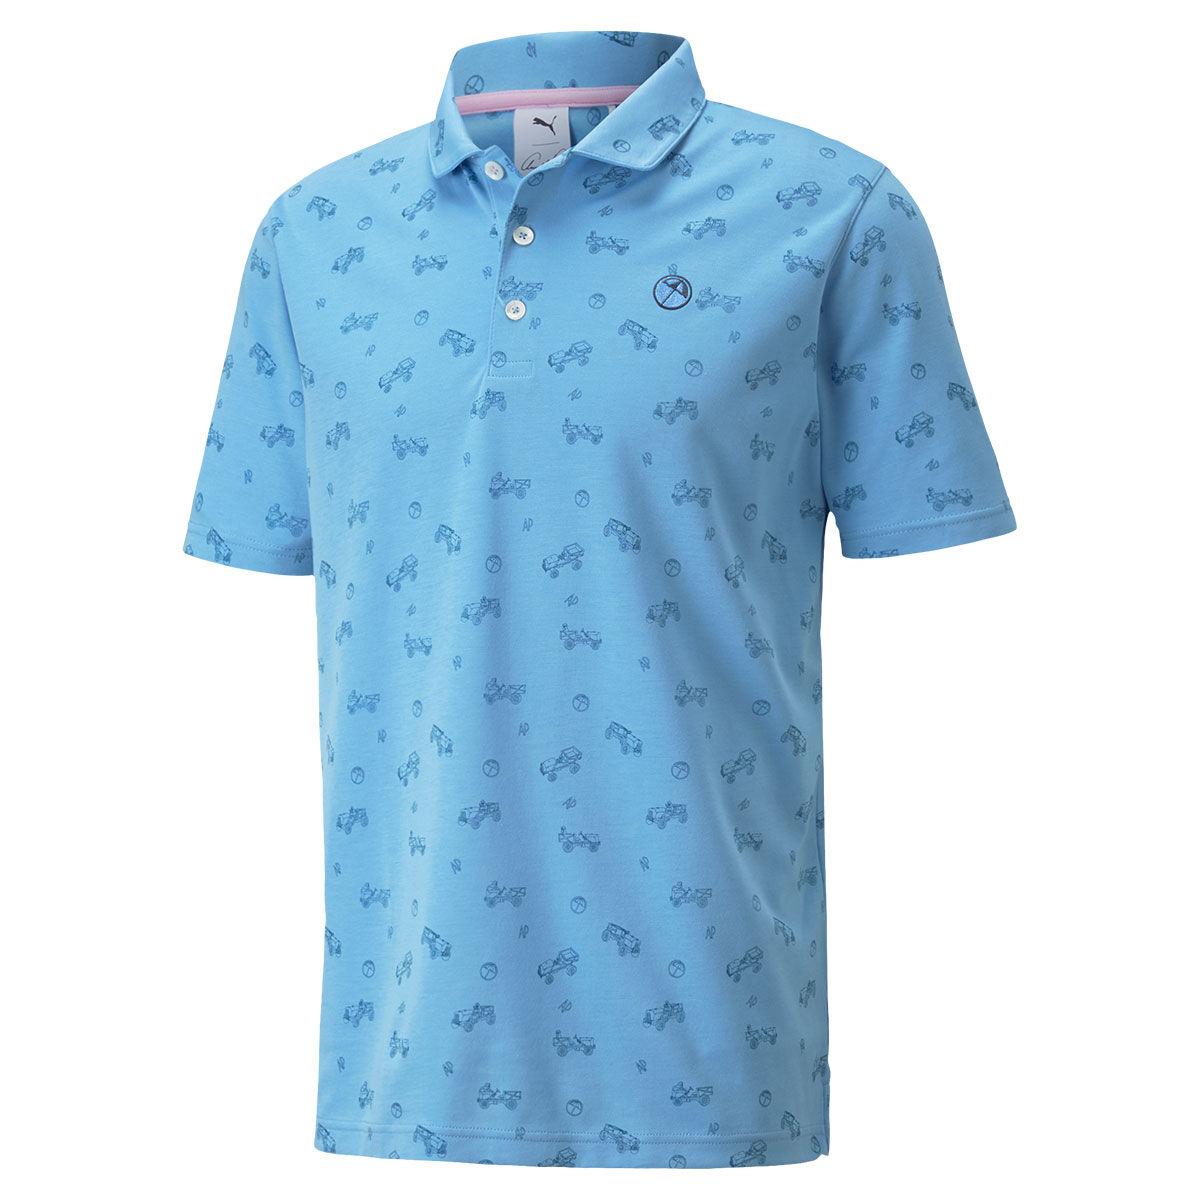 PUMA Golf AP Best Friend Golf Polo Shirt, Mens, Large, Team light blue | American Golf